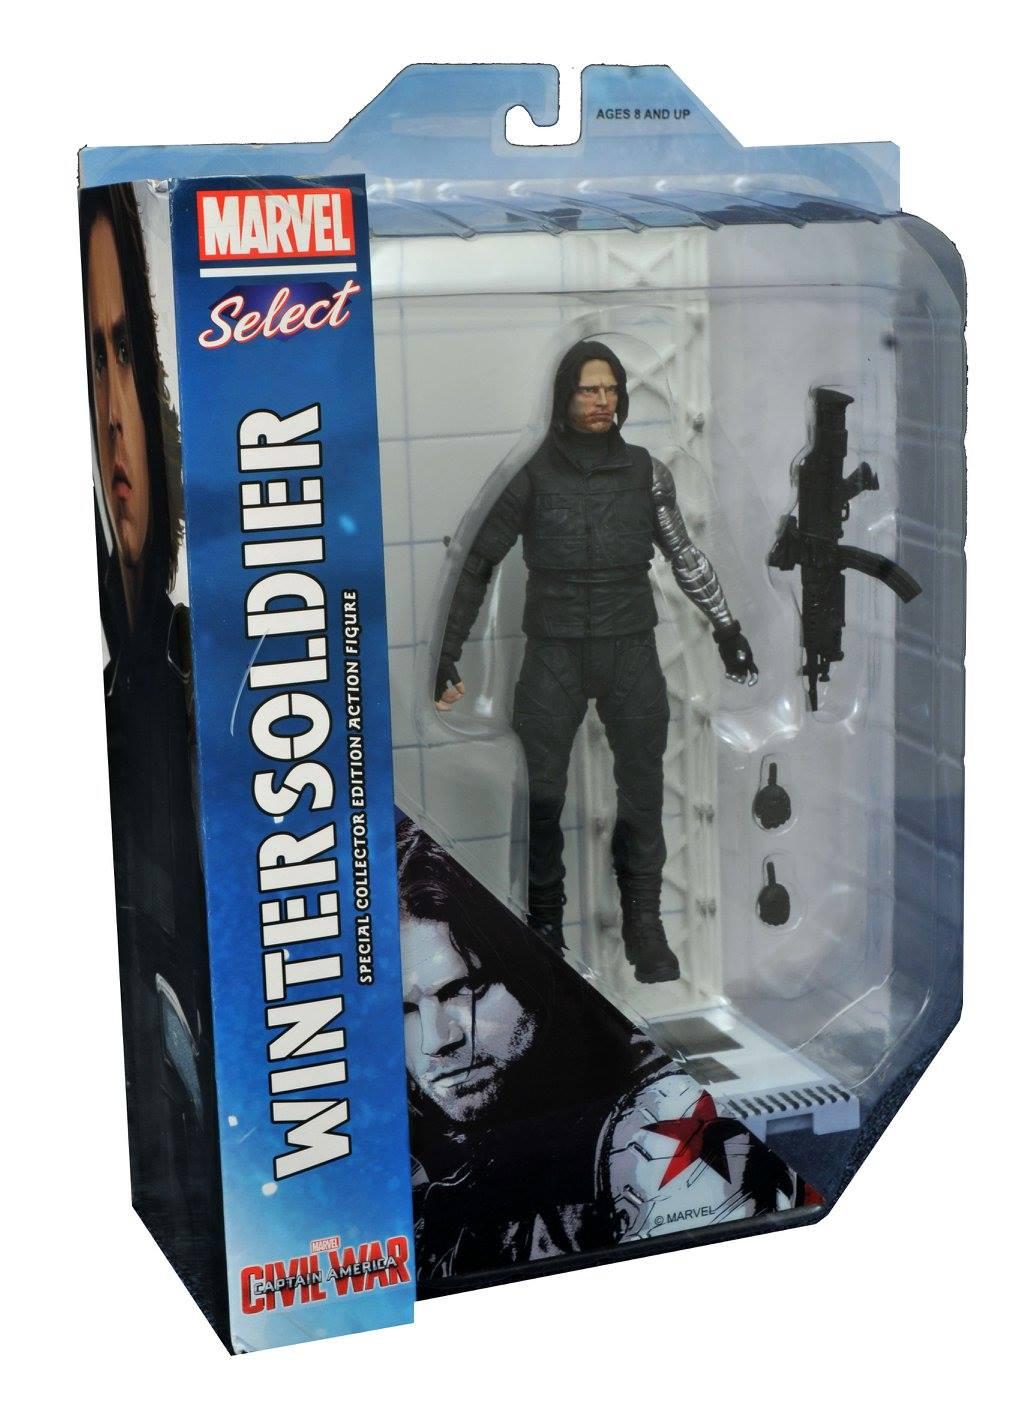 Winter Soldier ( Soldado Invernal ) - Captain America Civil War ( Capitão América Guerra Civil ) - Marvel Select - Diamond Select Toys